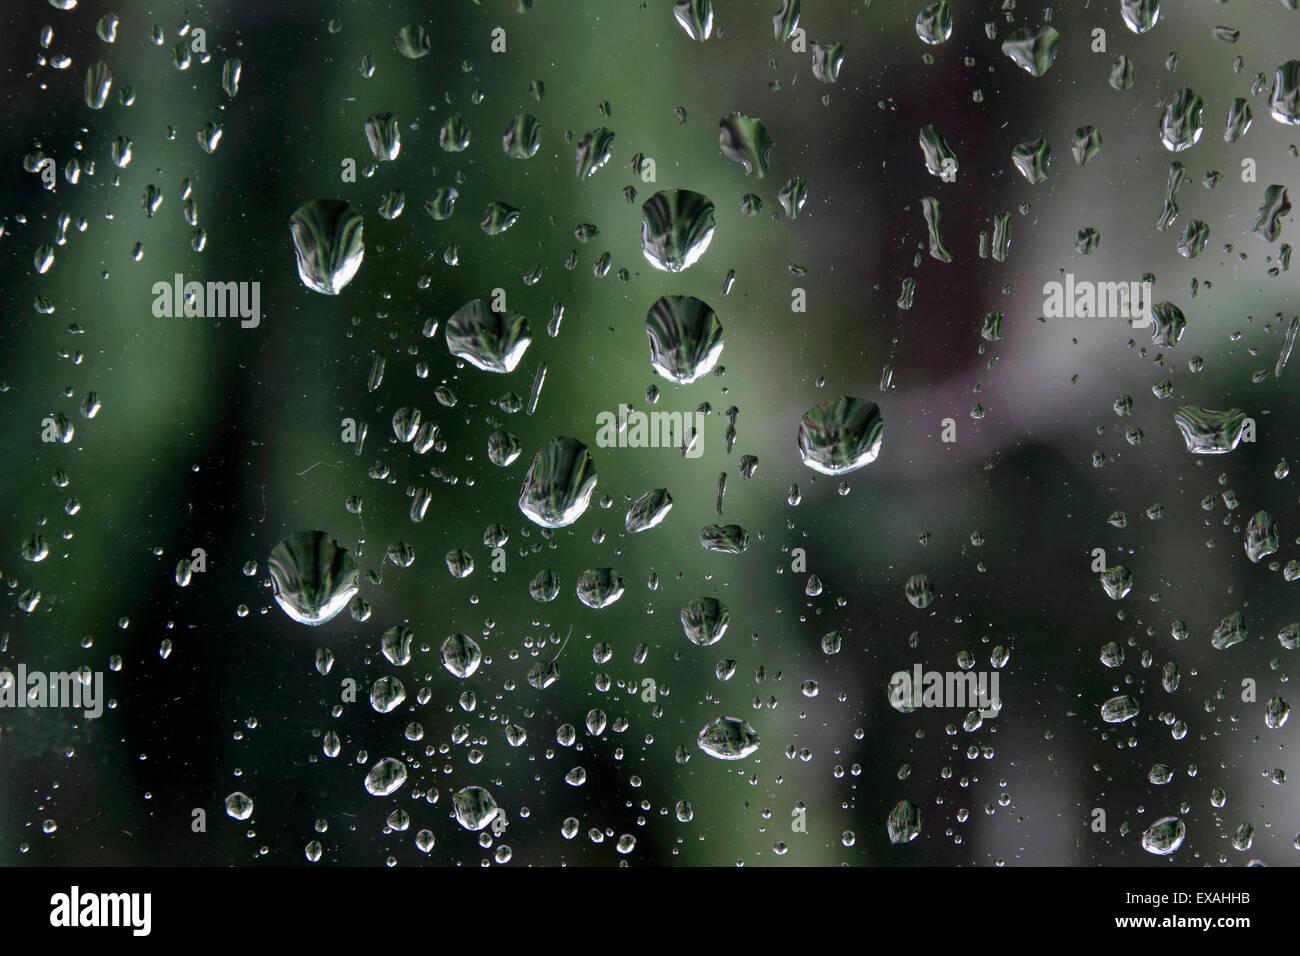 Rain drops on window glass - Stock Image